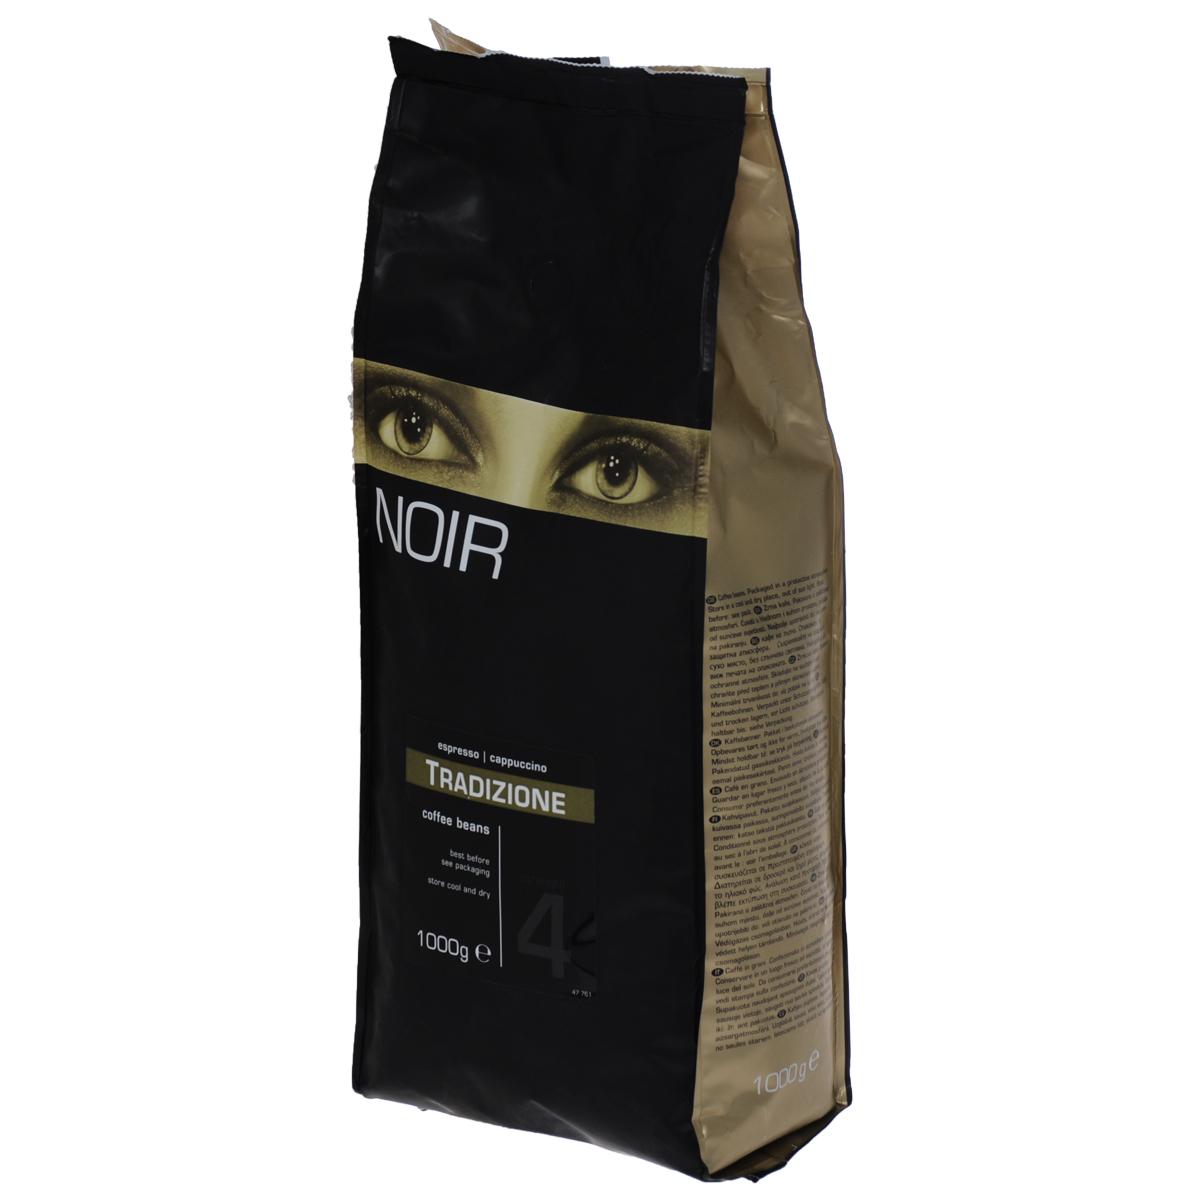 Noir Tradizione кофе в зернах, 1 кг